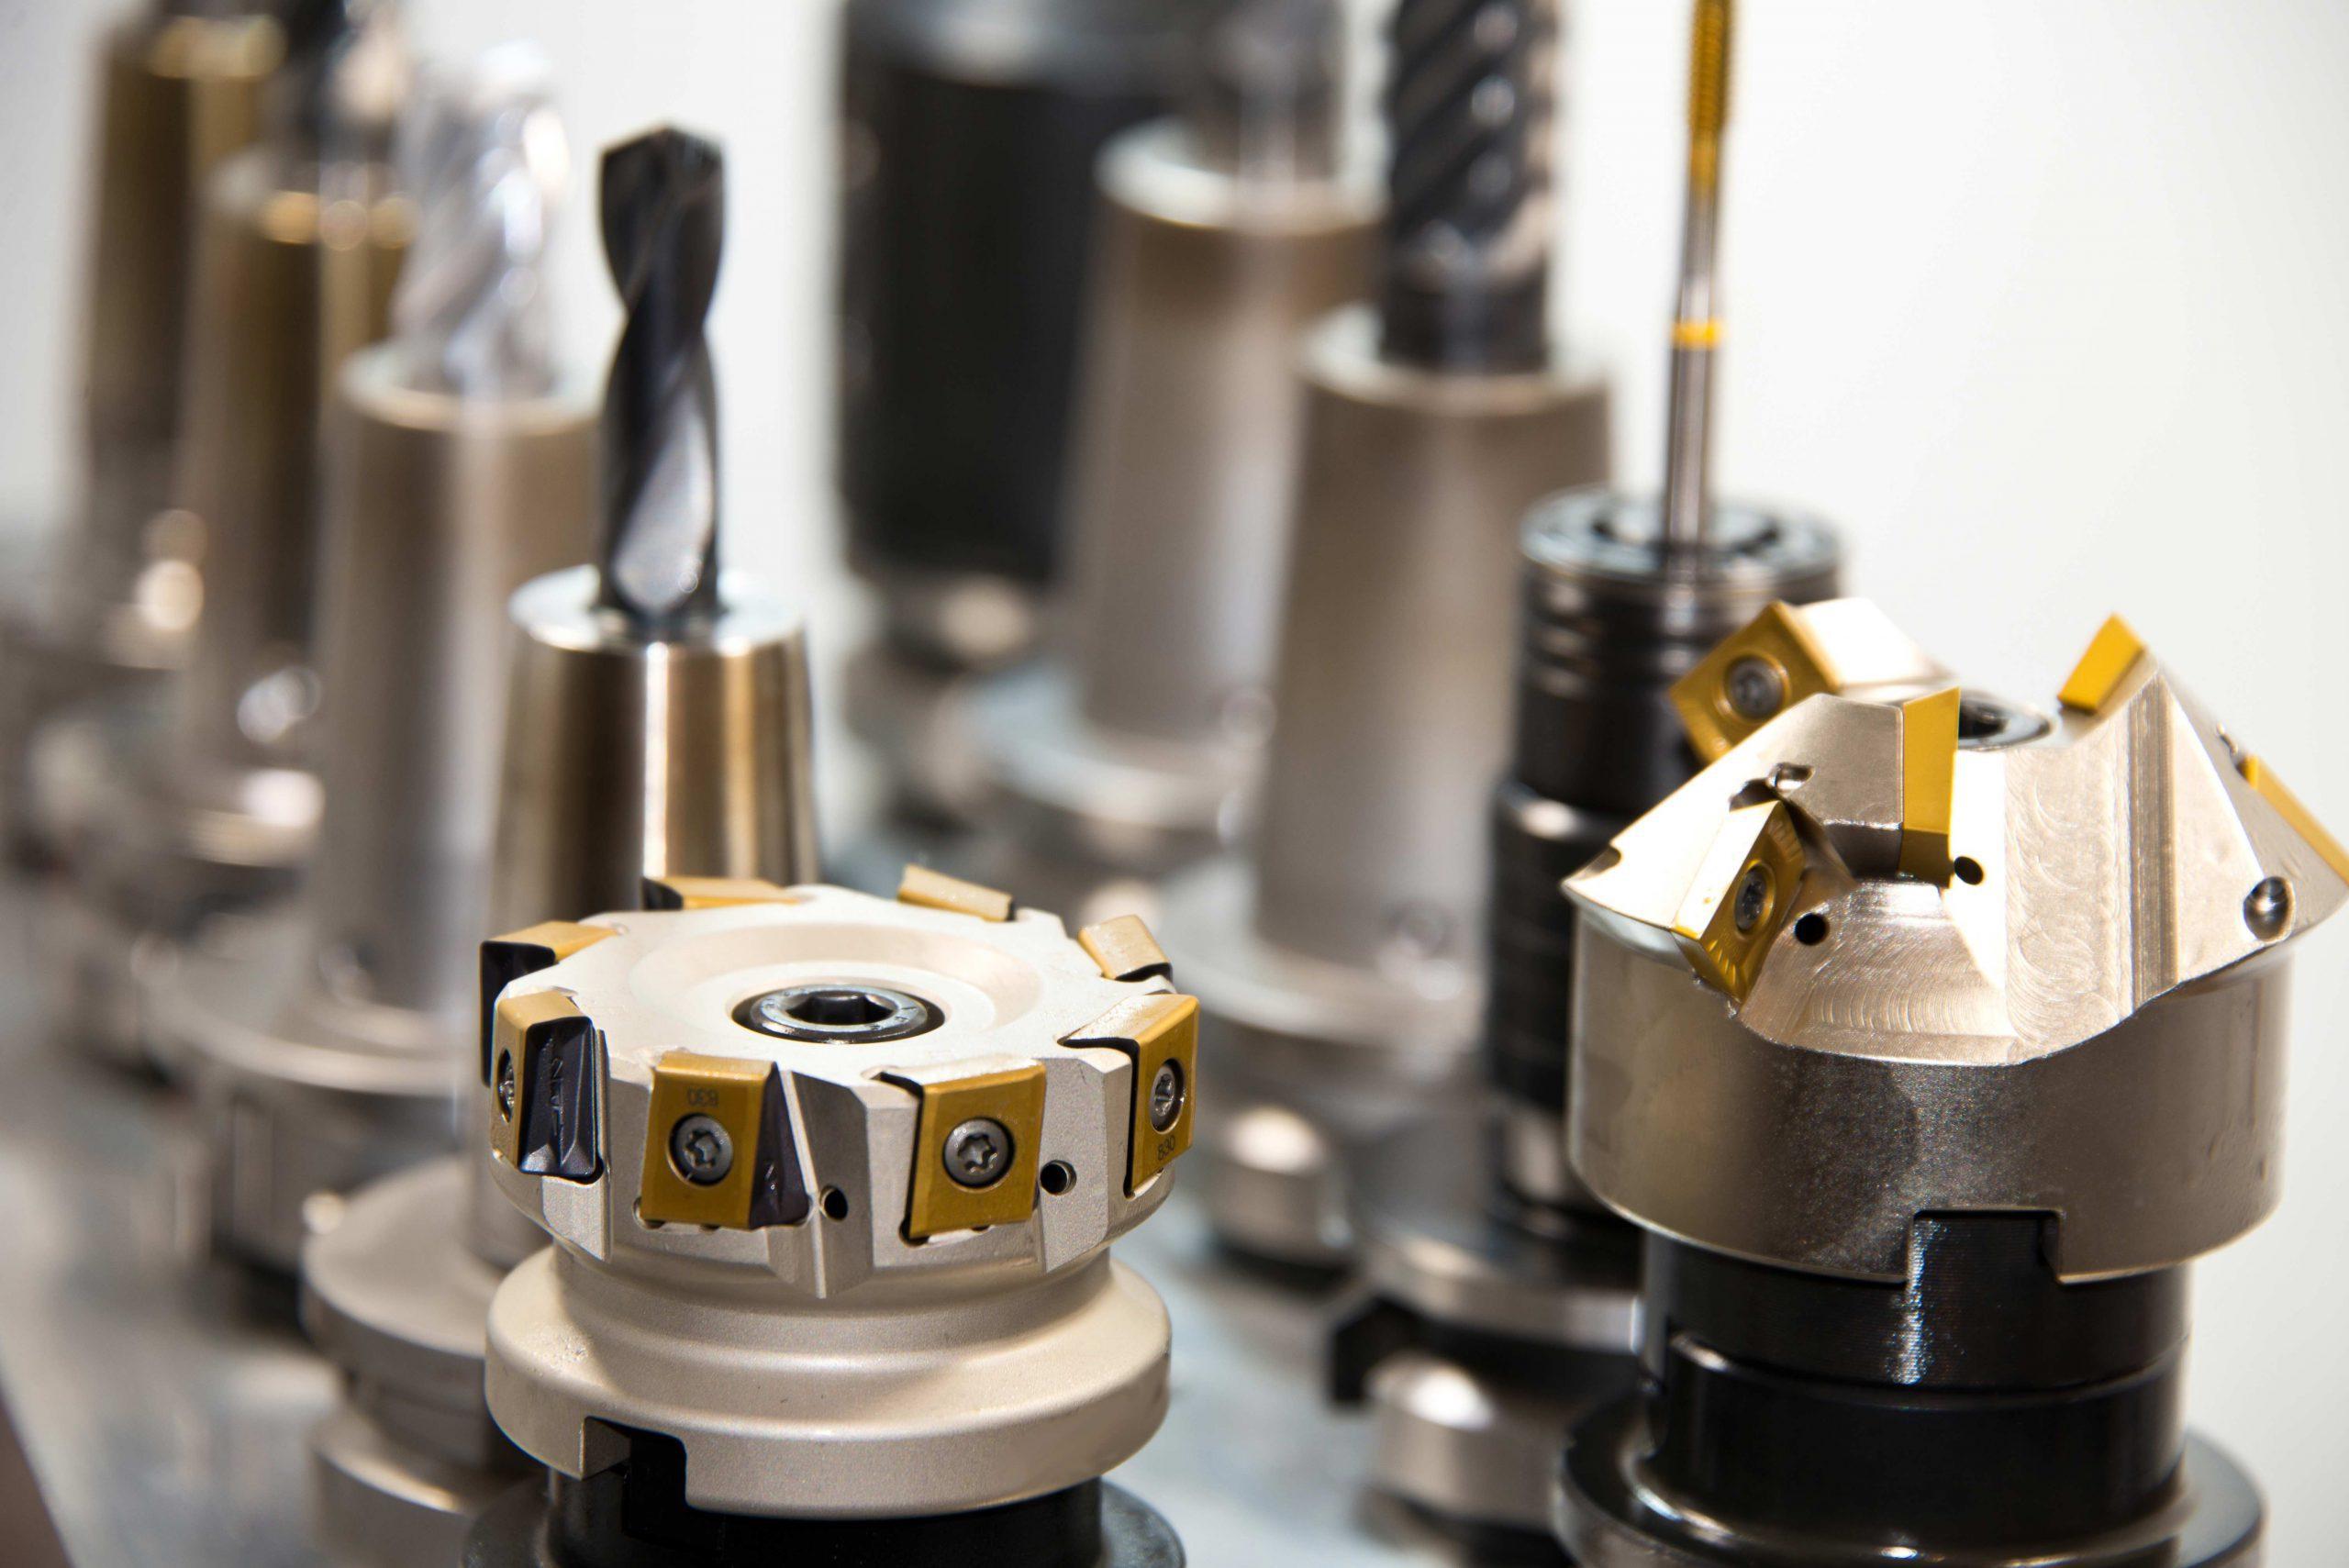 Custom Fabrication and Machine Shop